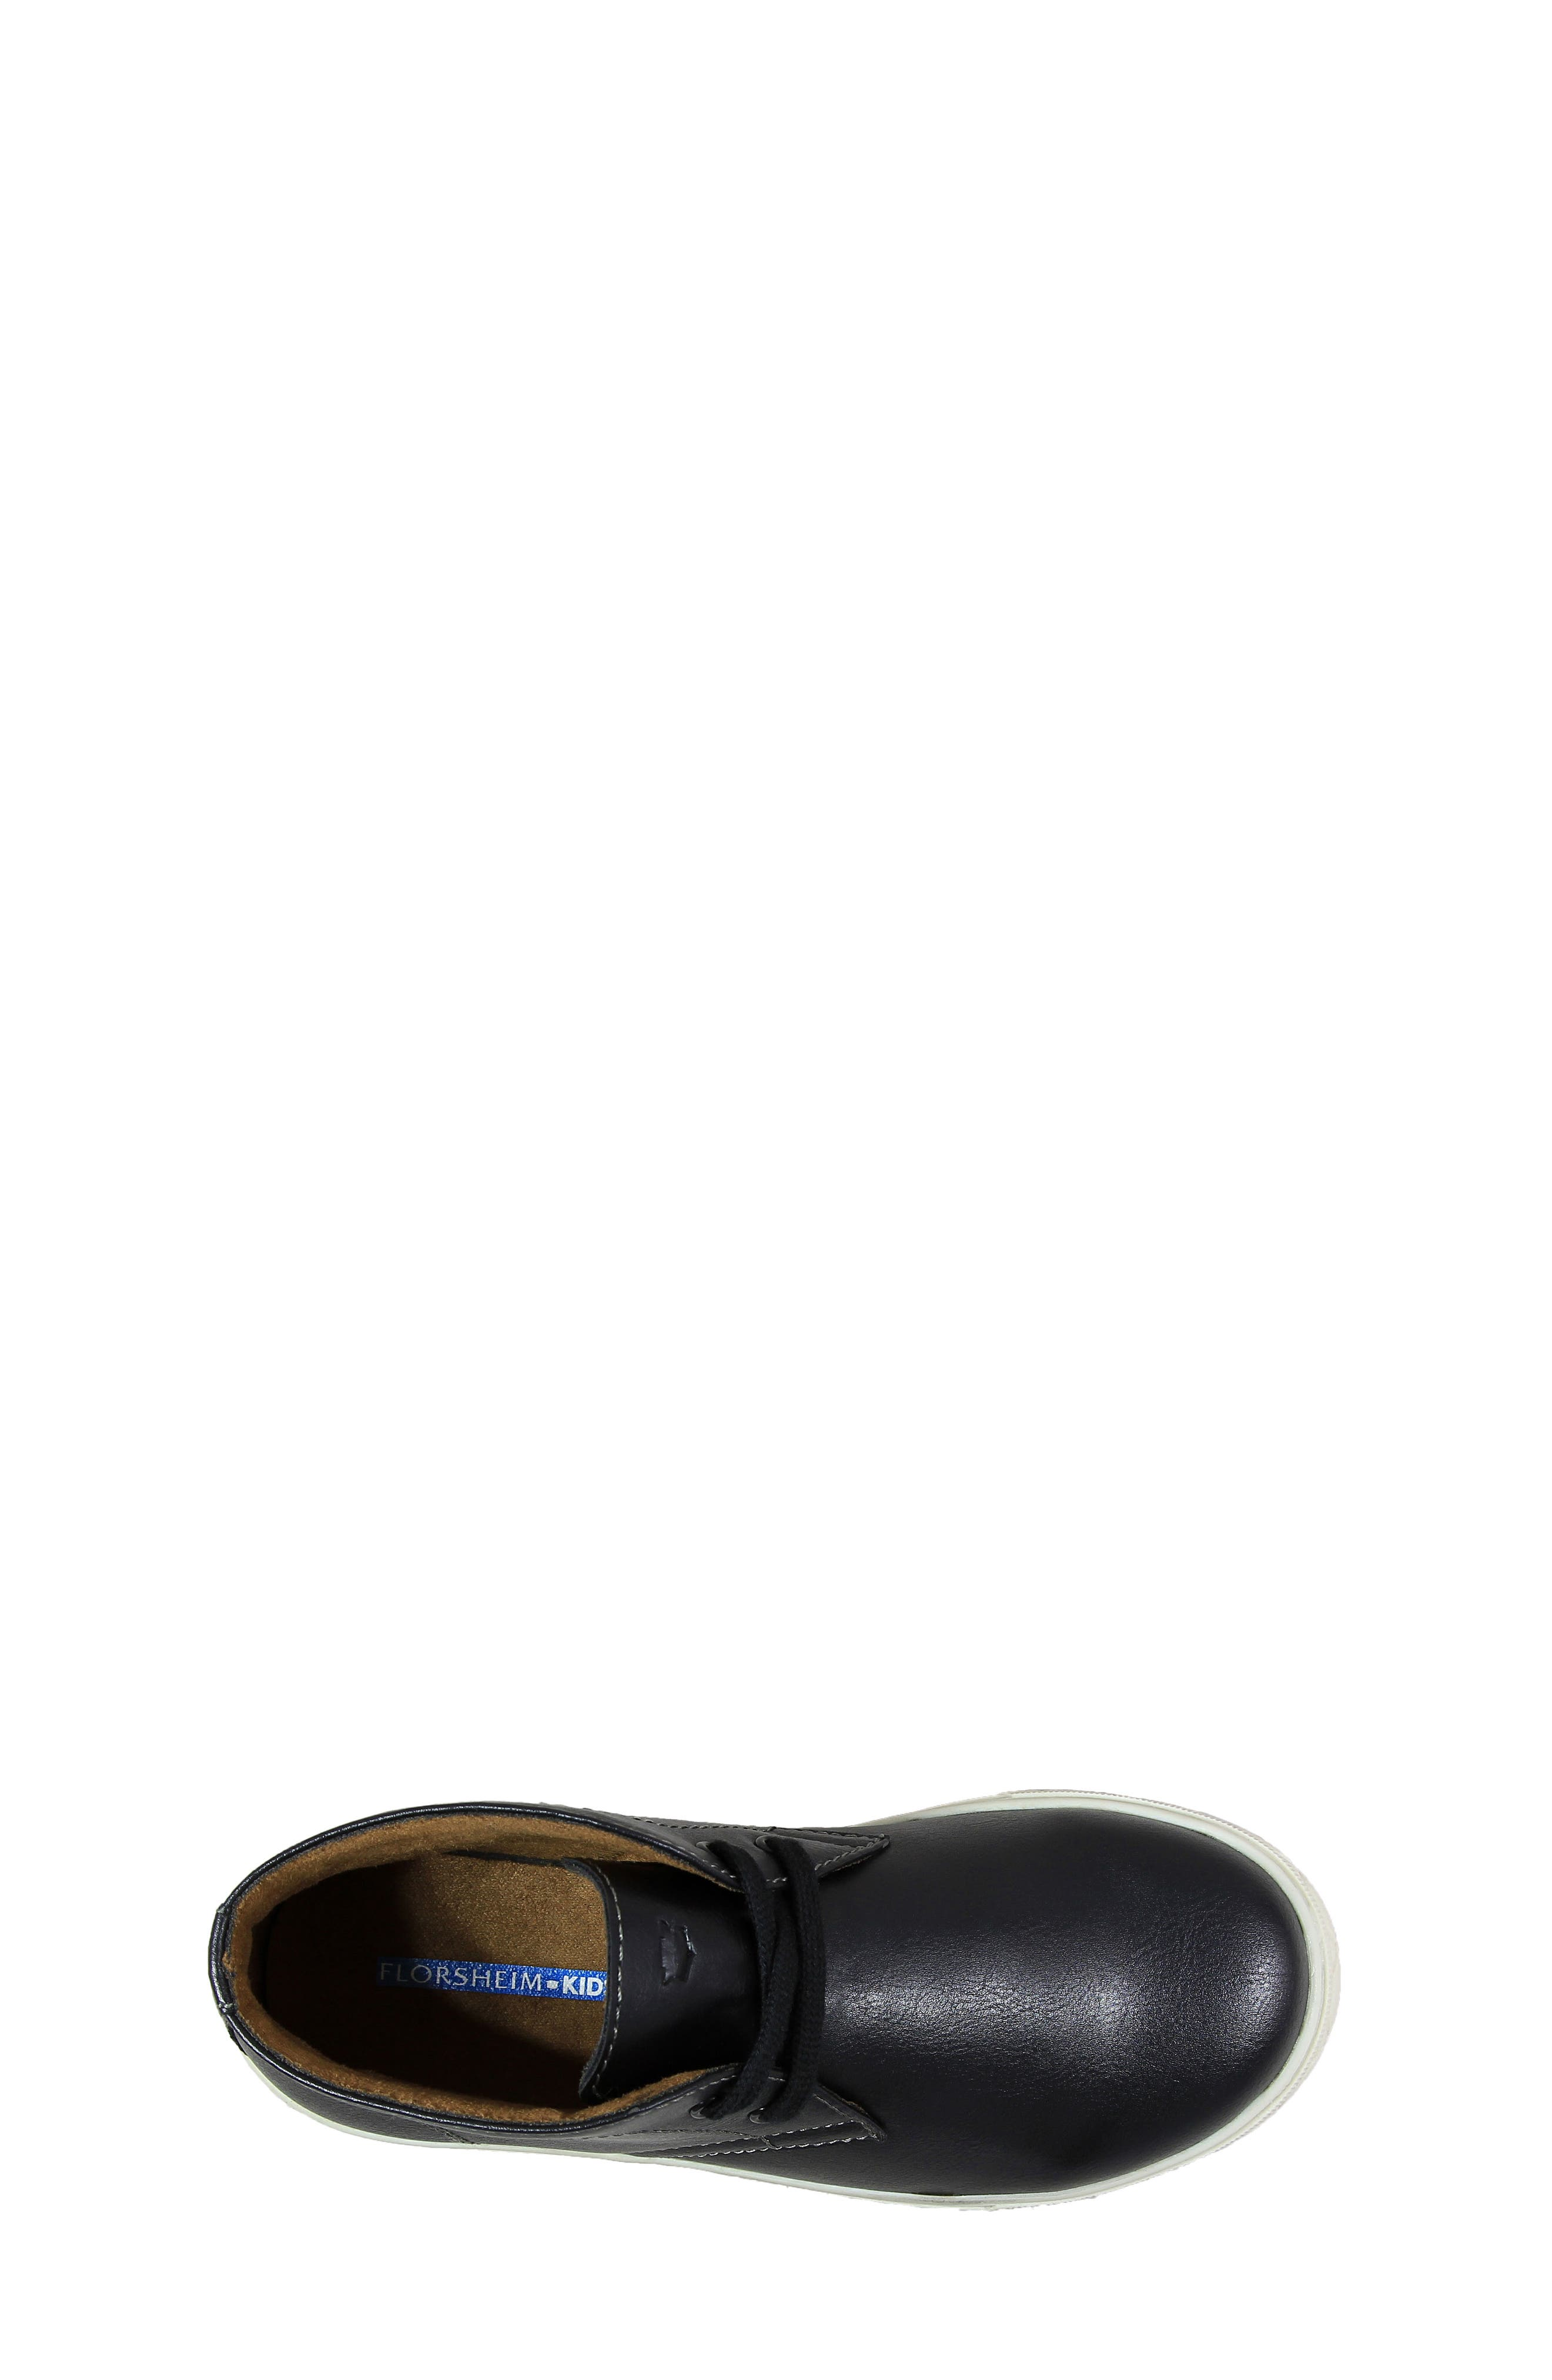 FLORSHEIM, Curb Chukka Sneaker Boot, Alternate thumbnail 4, color, 001